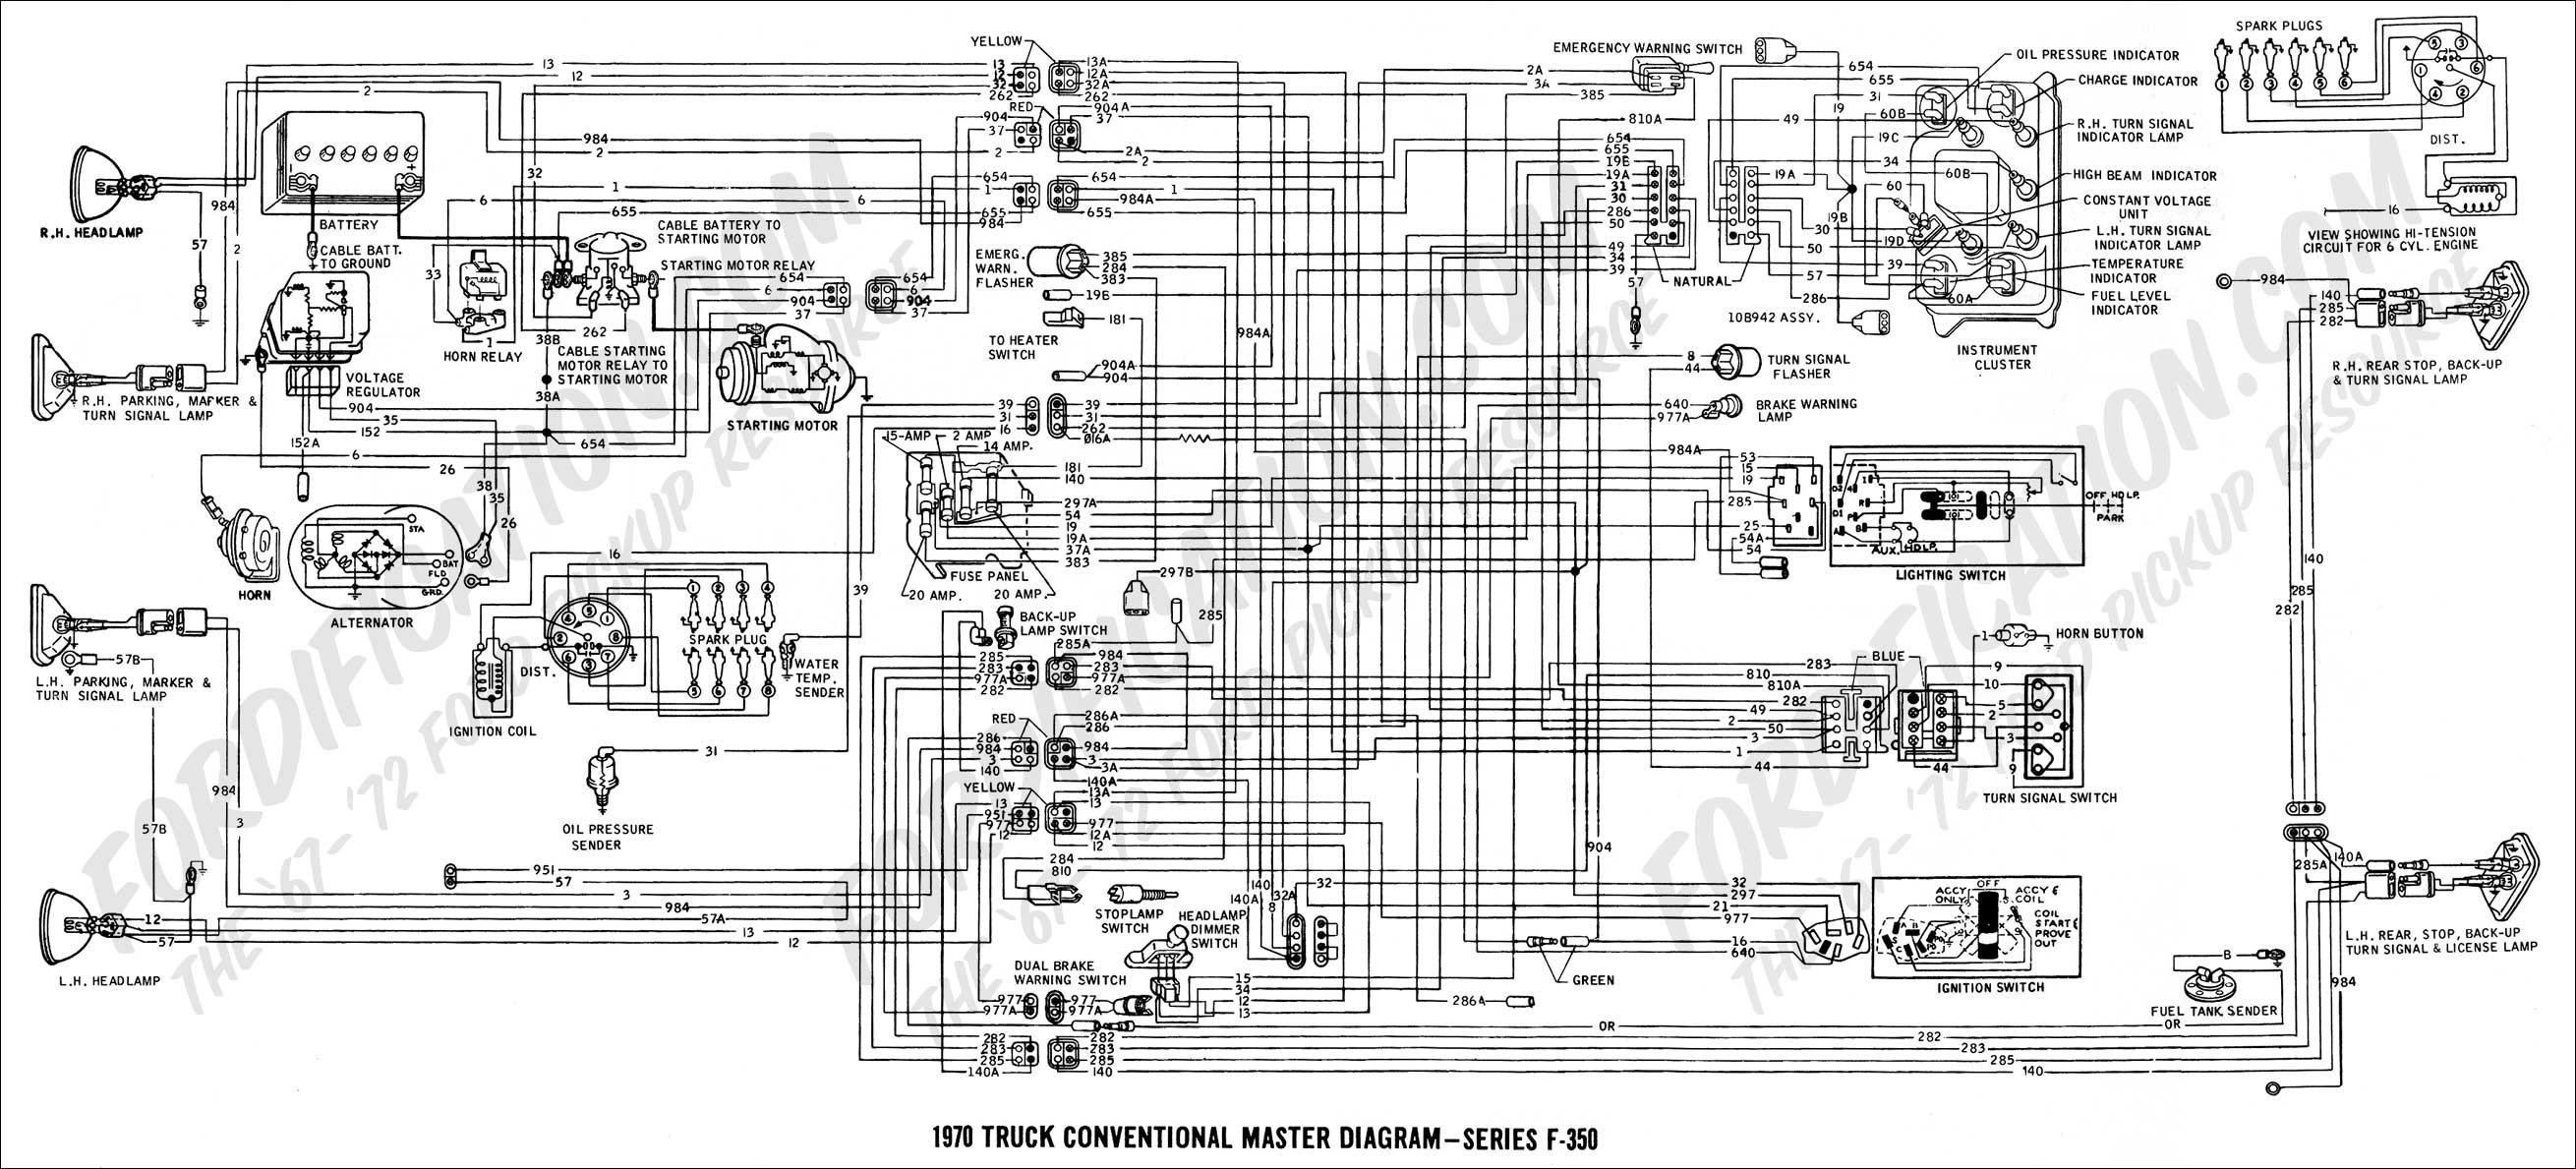 1999 ford F250 Brake Lights Wiring Diagram 2001 ford F350 Wiring Diagram Wiring Diagram Schematic Of 1999 ford F250 Brake Lights Wiring Diagram